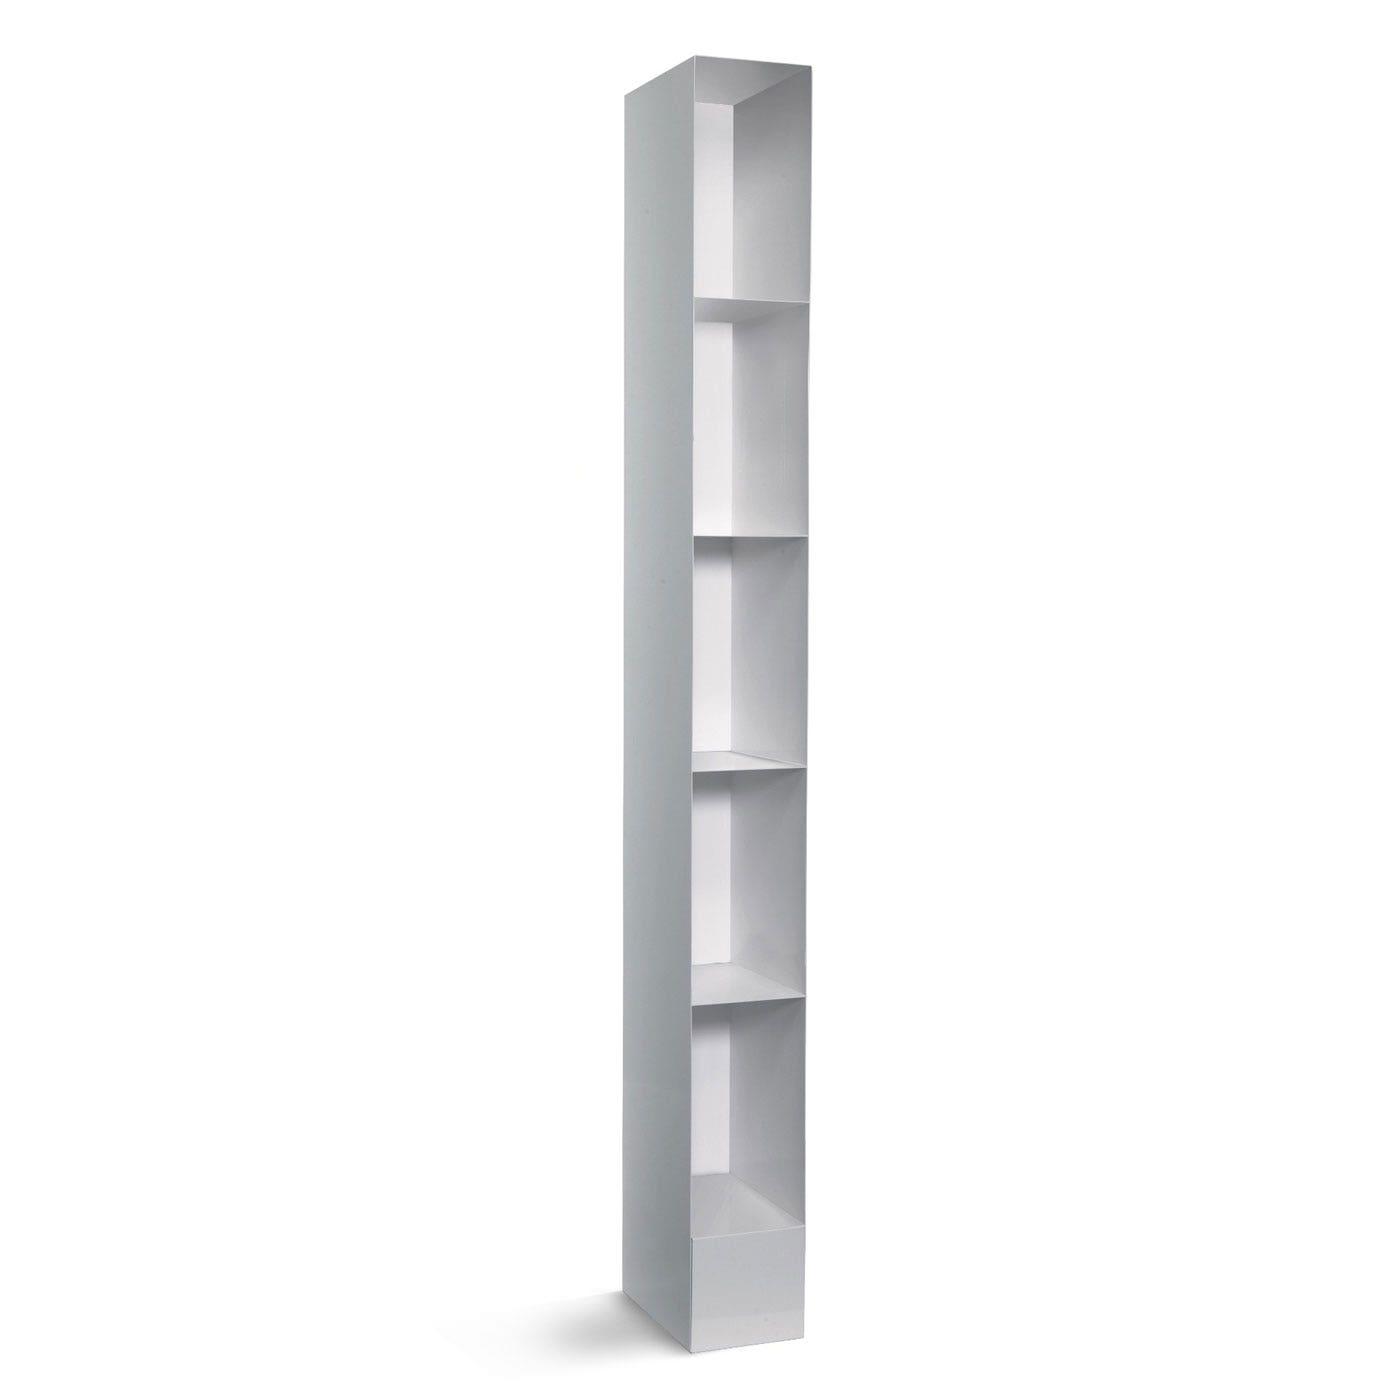 totem bookcase  modern bookcases  blu dot - previous image totem bookcase  white